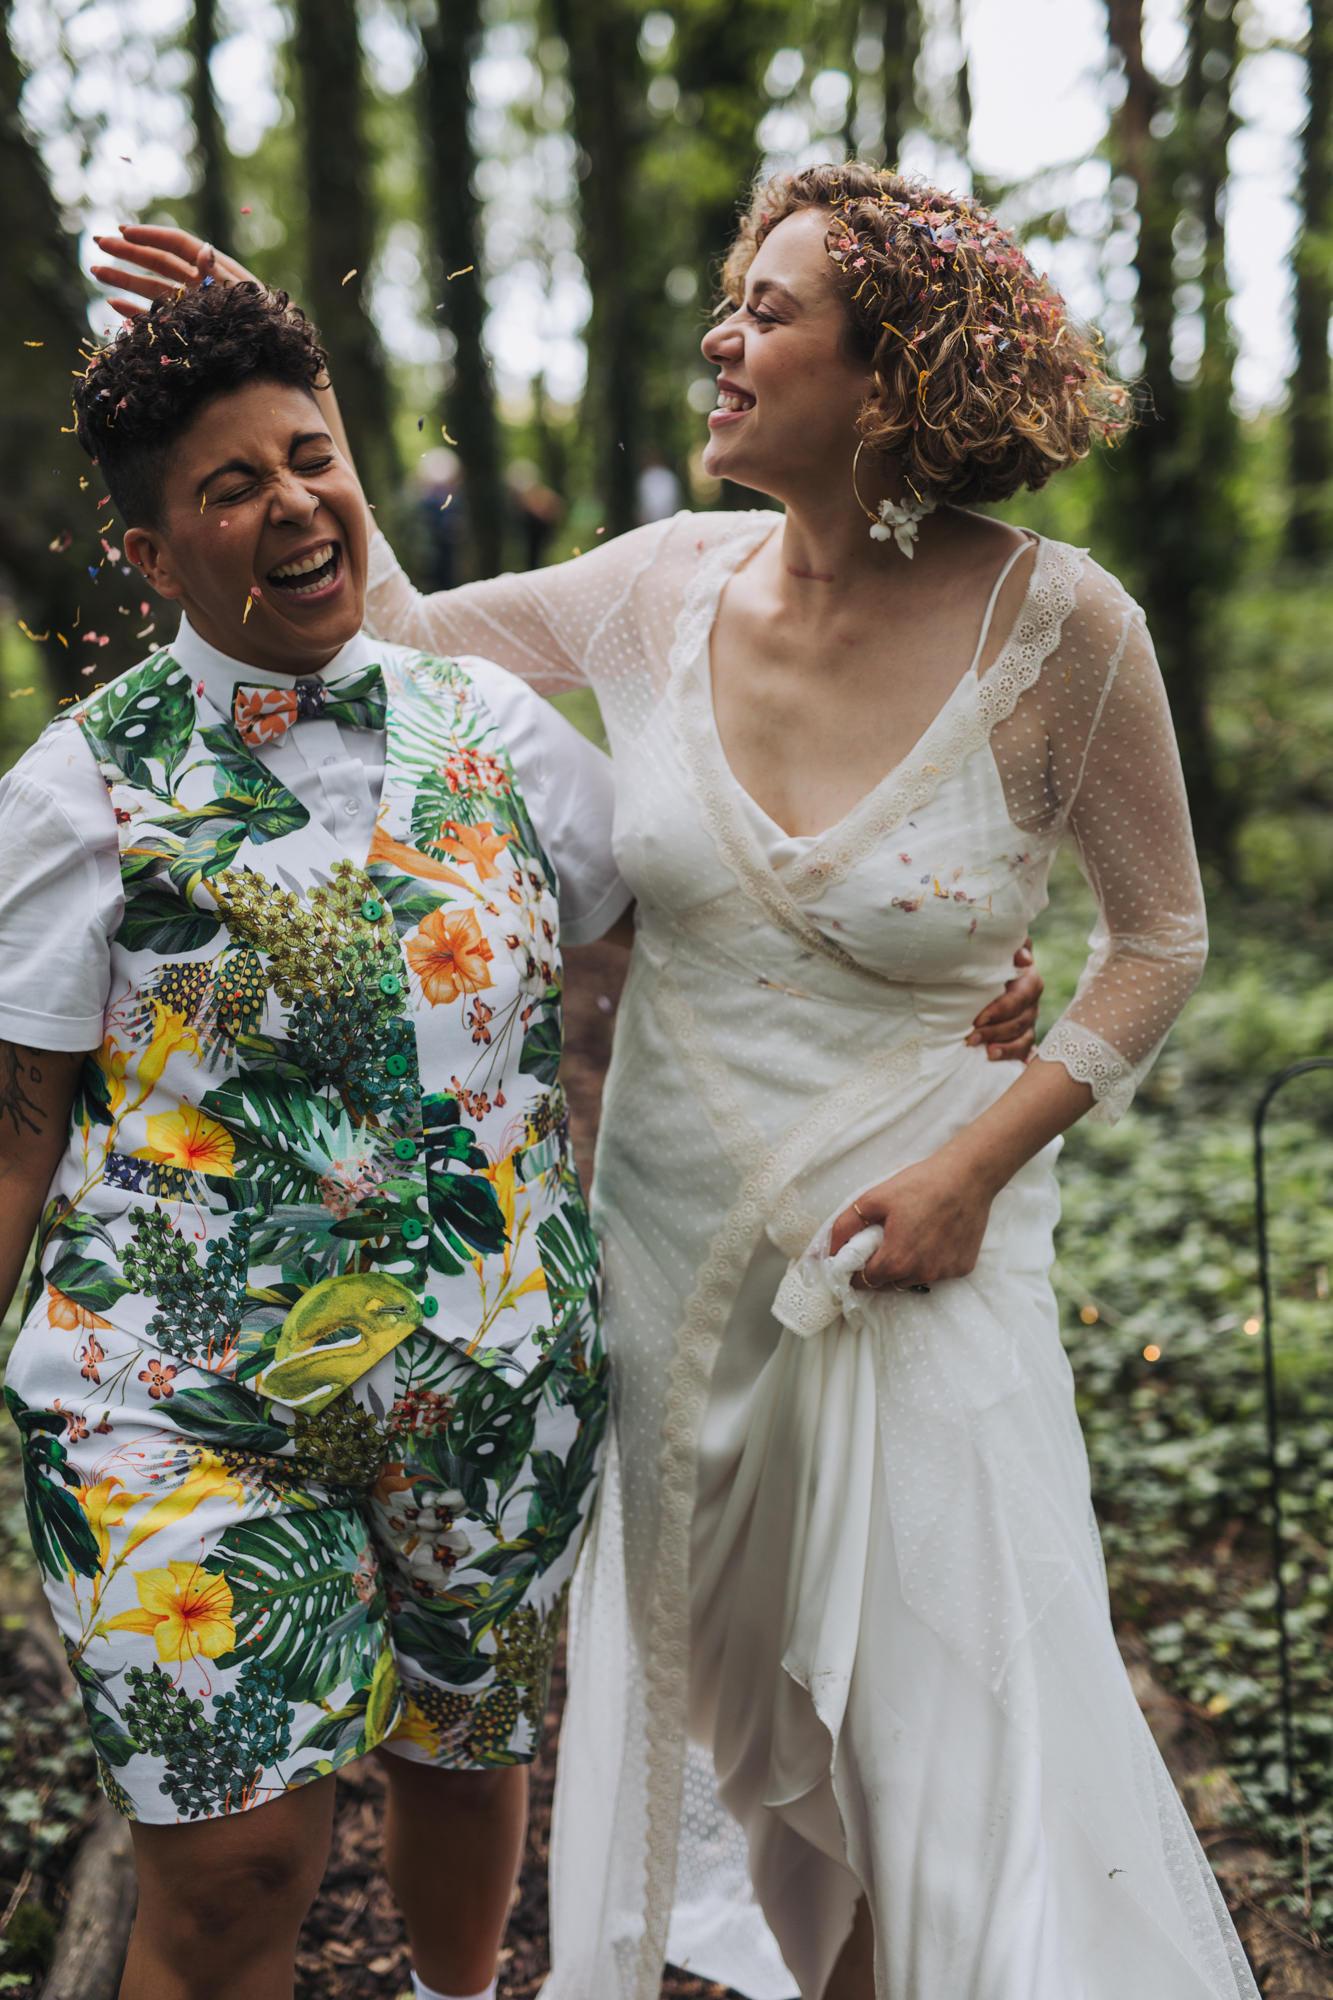 applewood wedding photographer leeds, yorkshire41.jpg